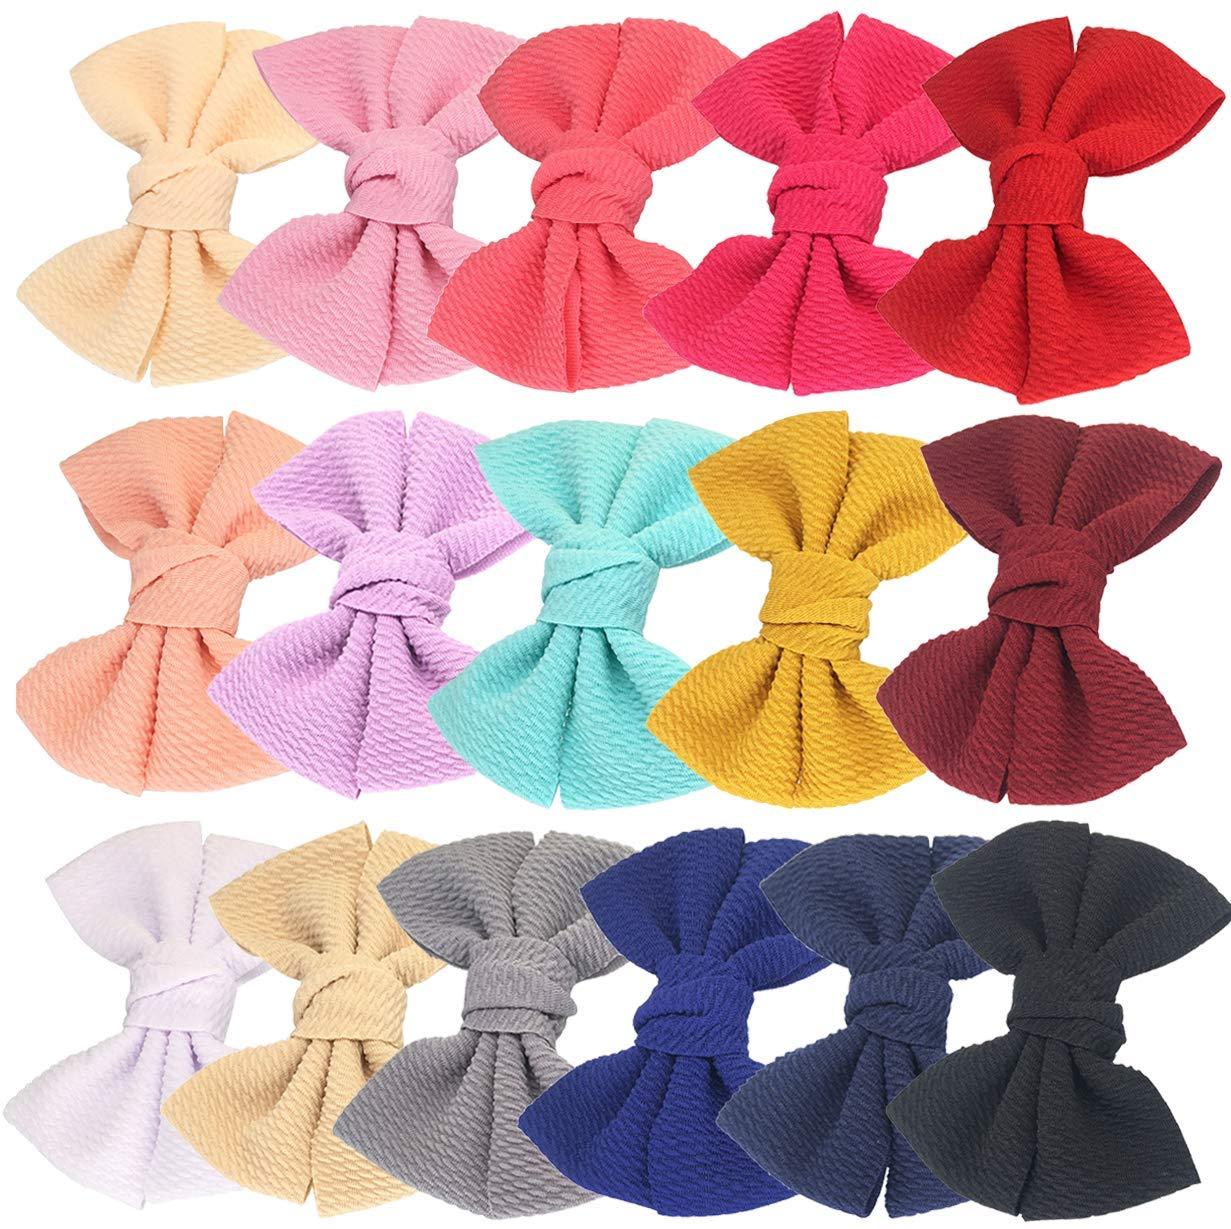 16pcs Baby Girl's Hair Bows Cheap sale Fabric 4 Clips Las Vegas Mall inch